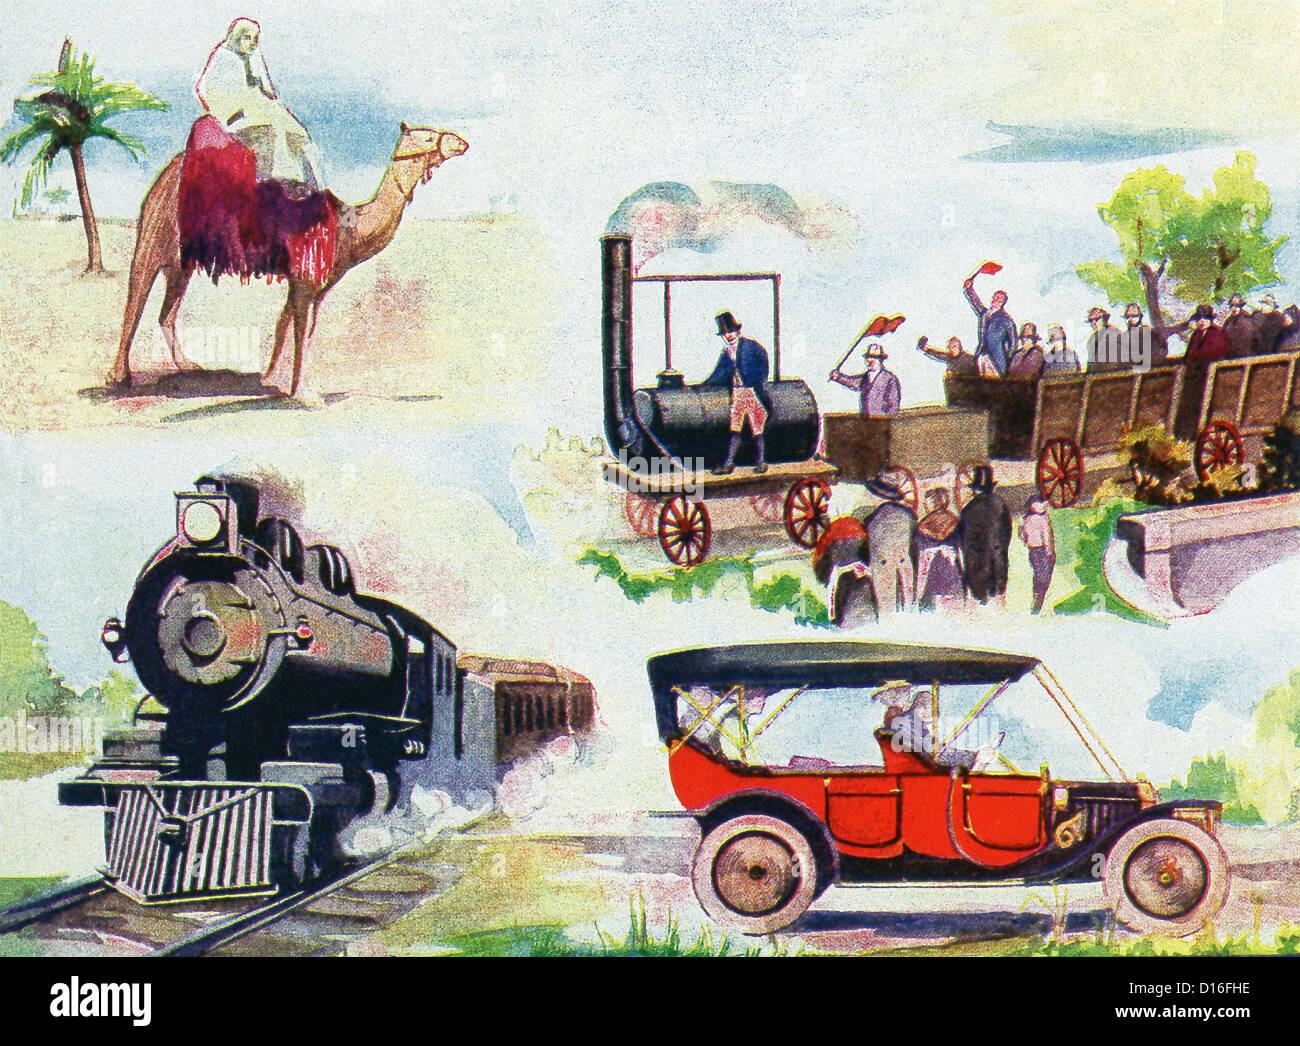 Land Transportation Camel Ship Of The Desert First